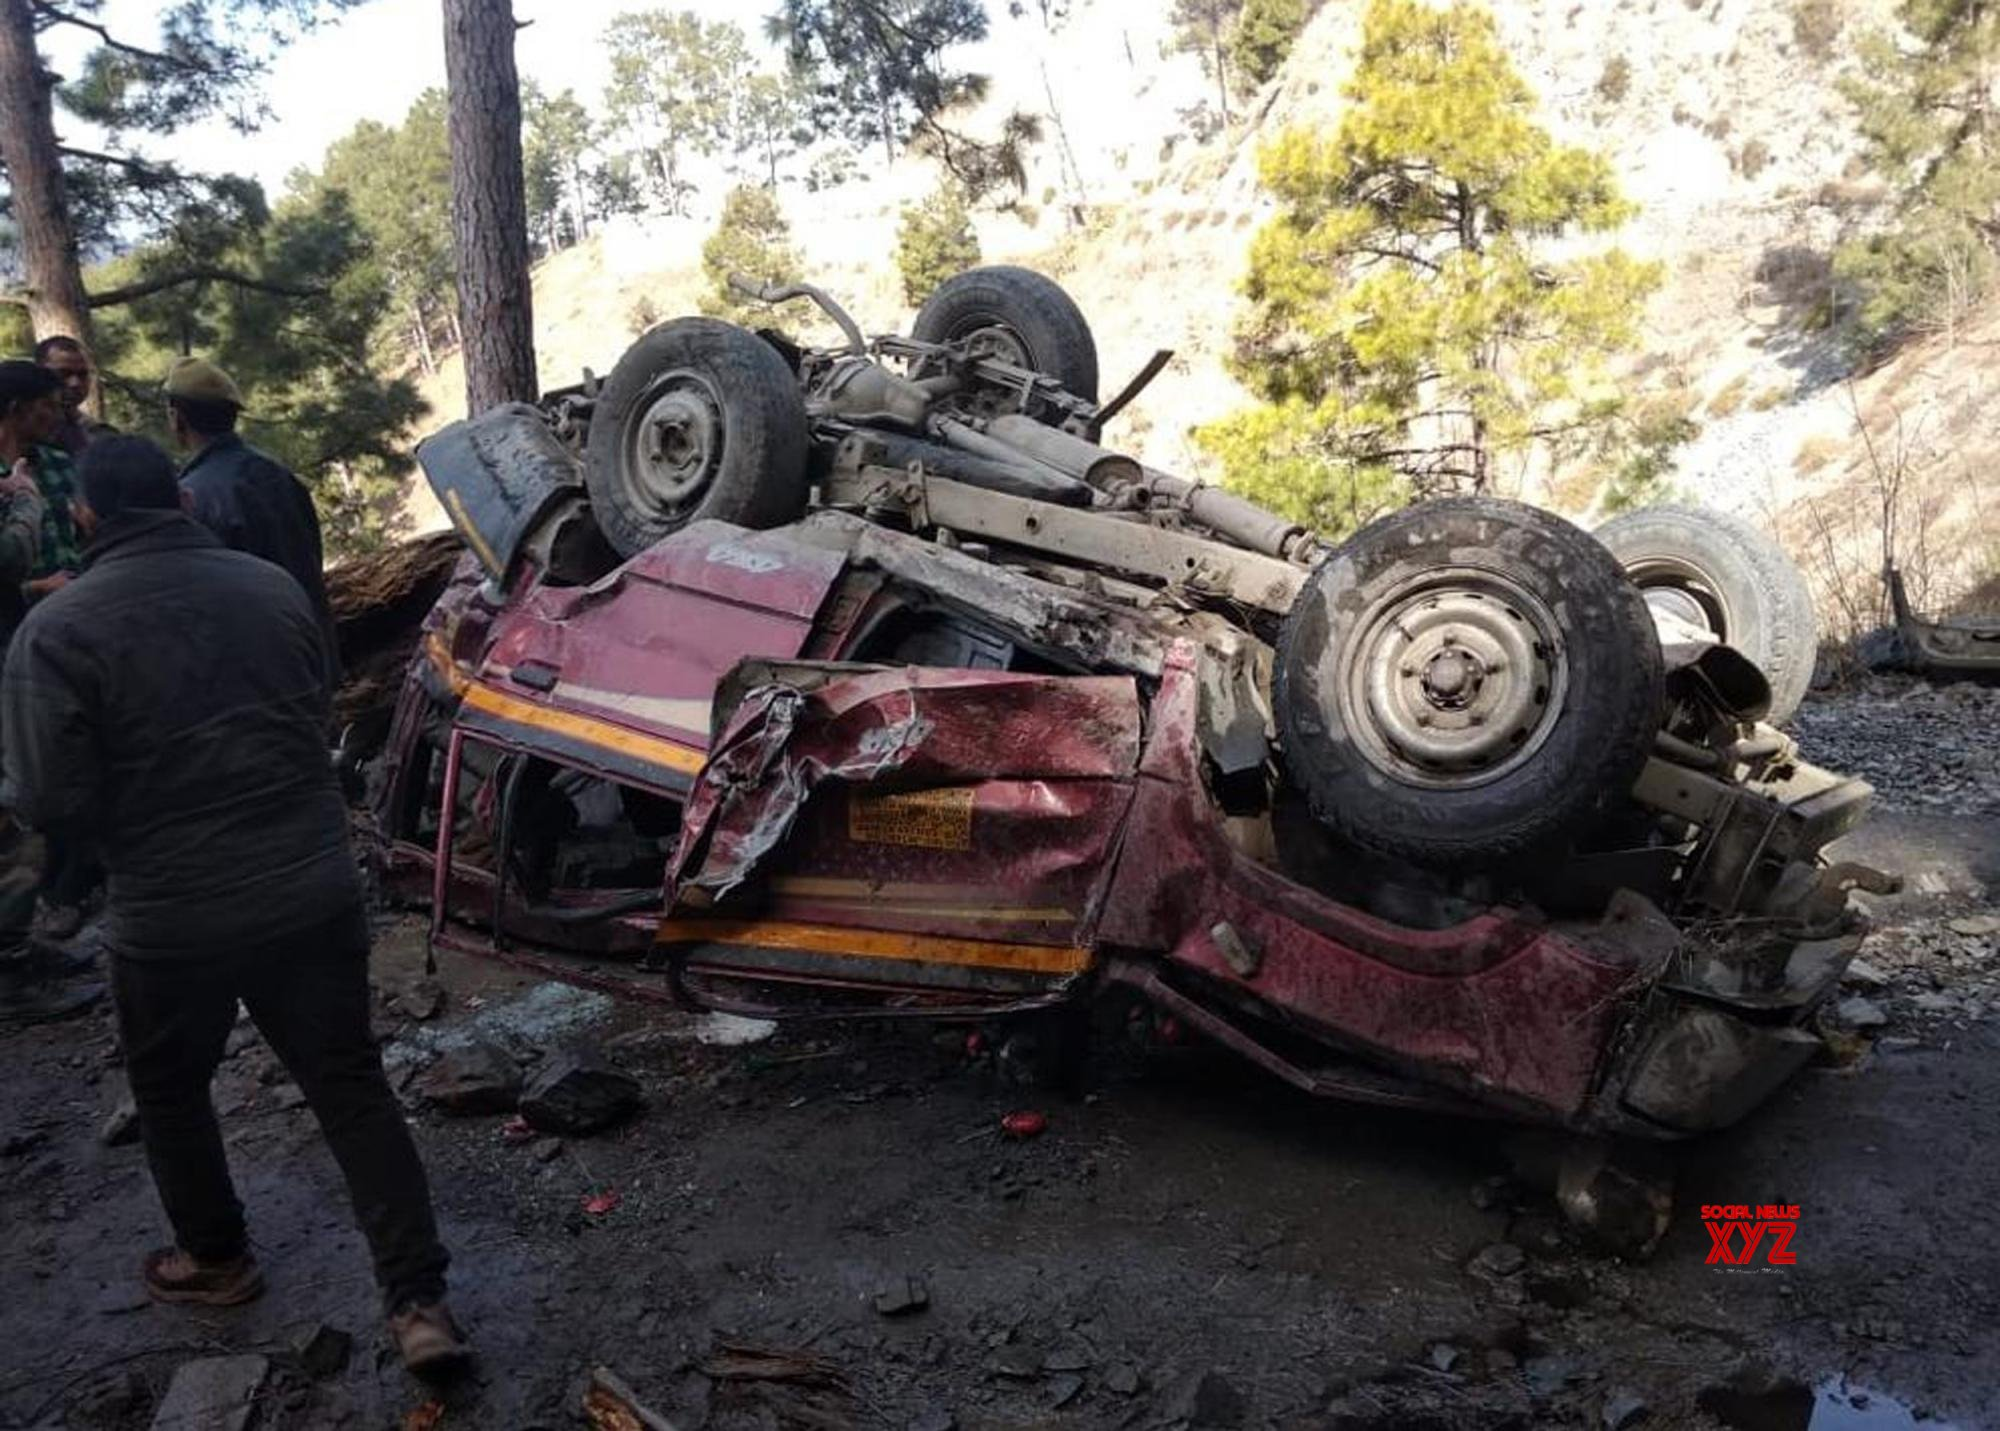 Ramban: 5 killed, 8 injured in J&K road accident #Gallery